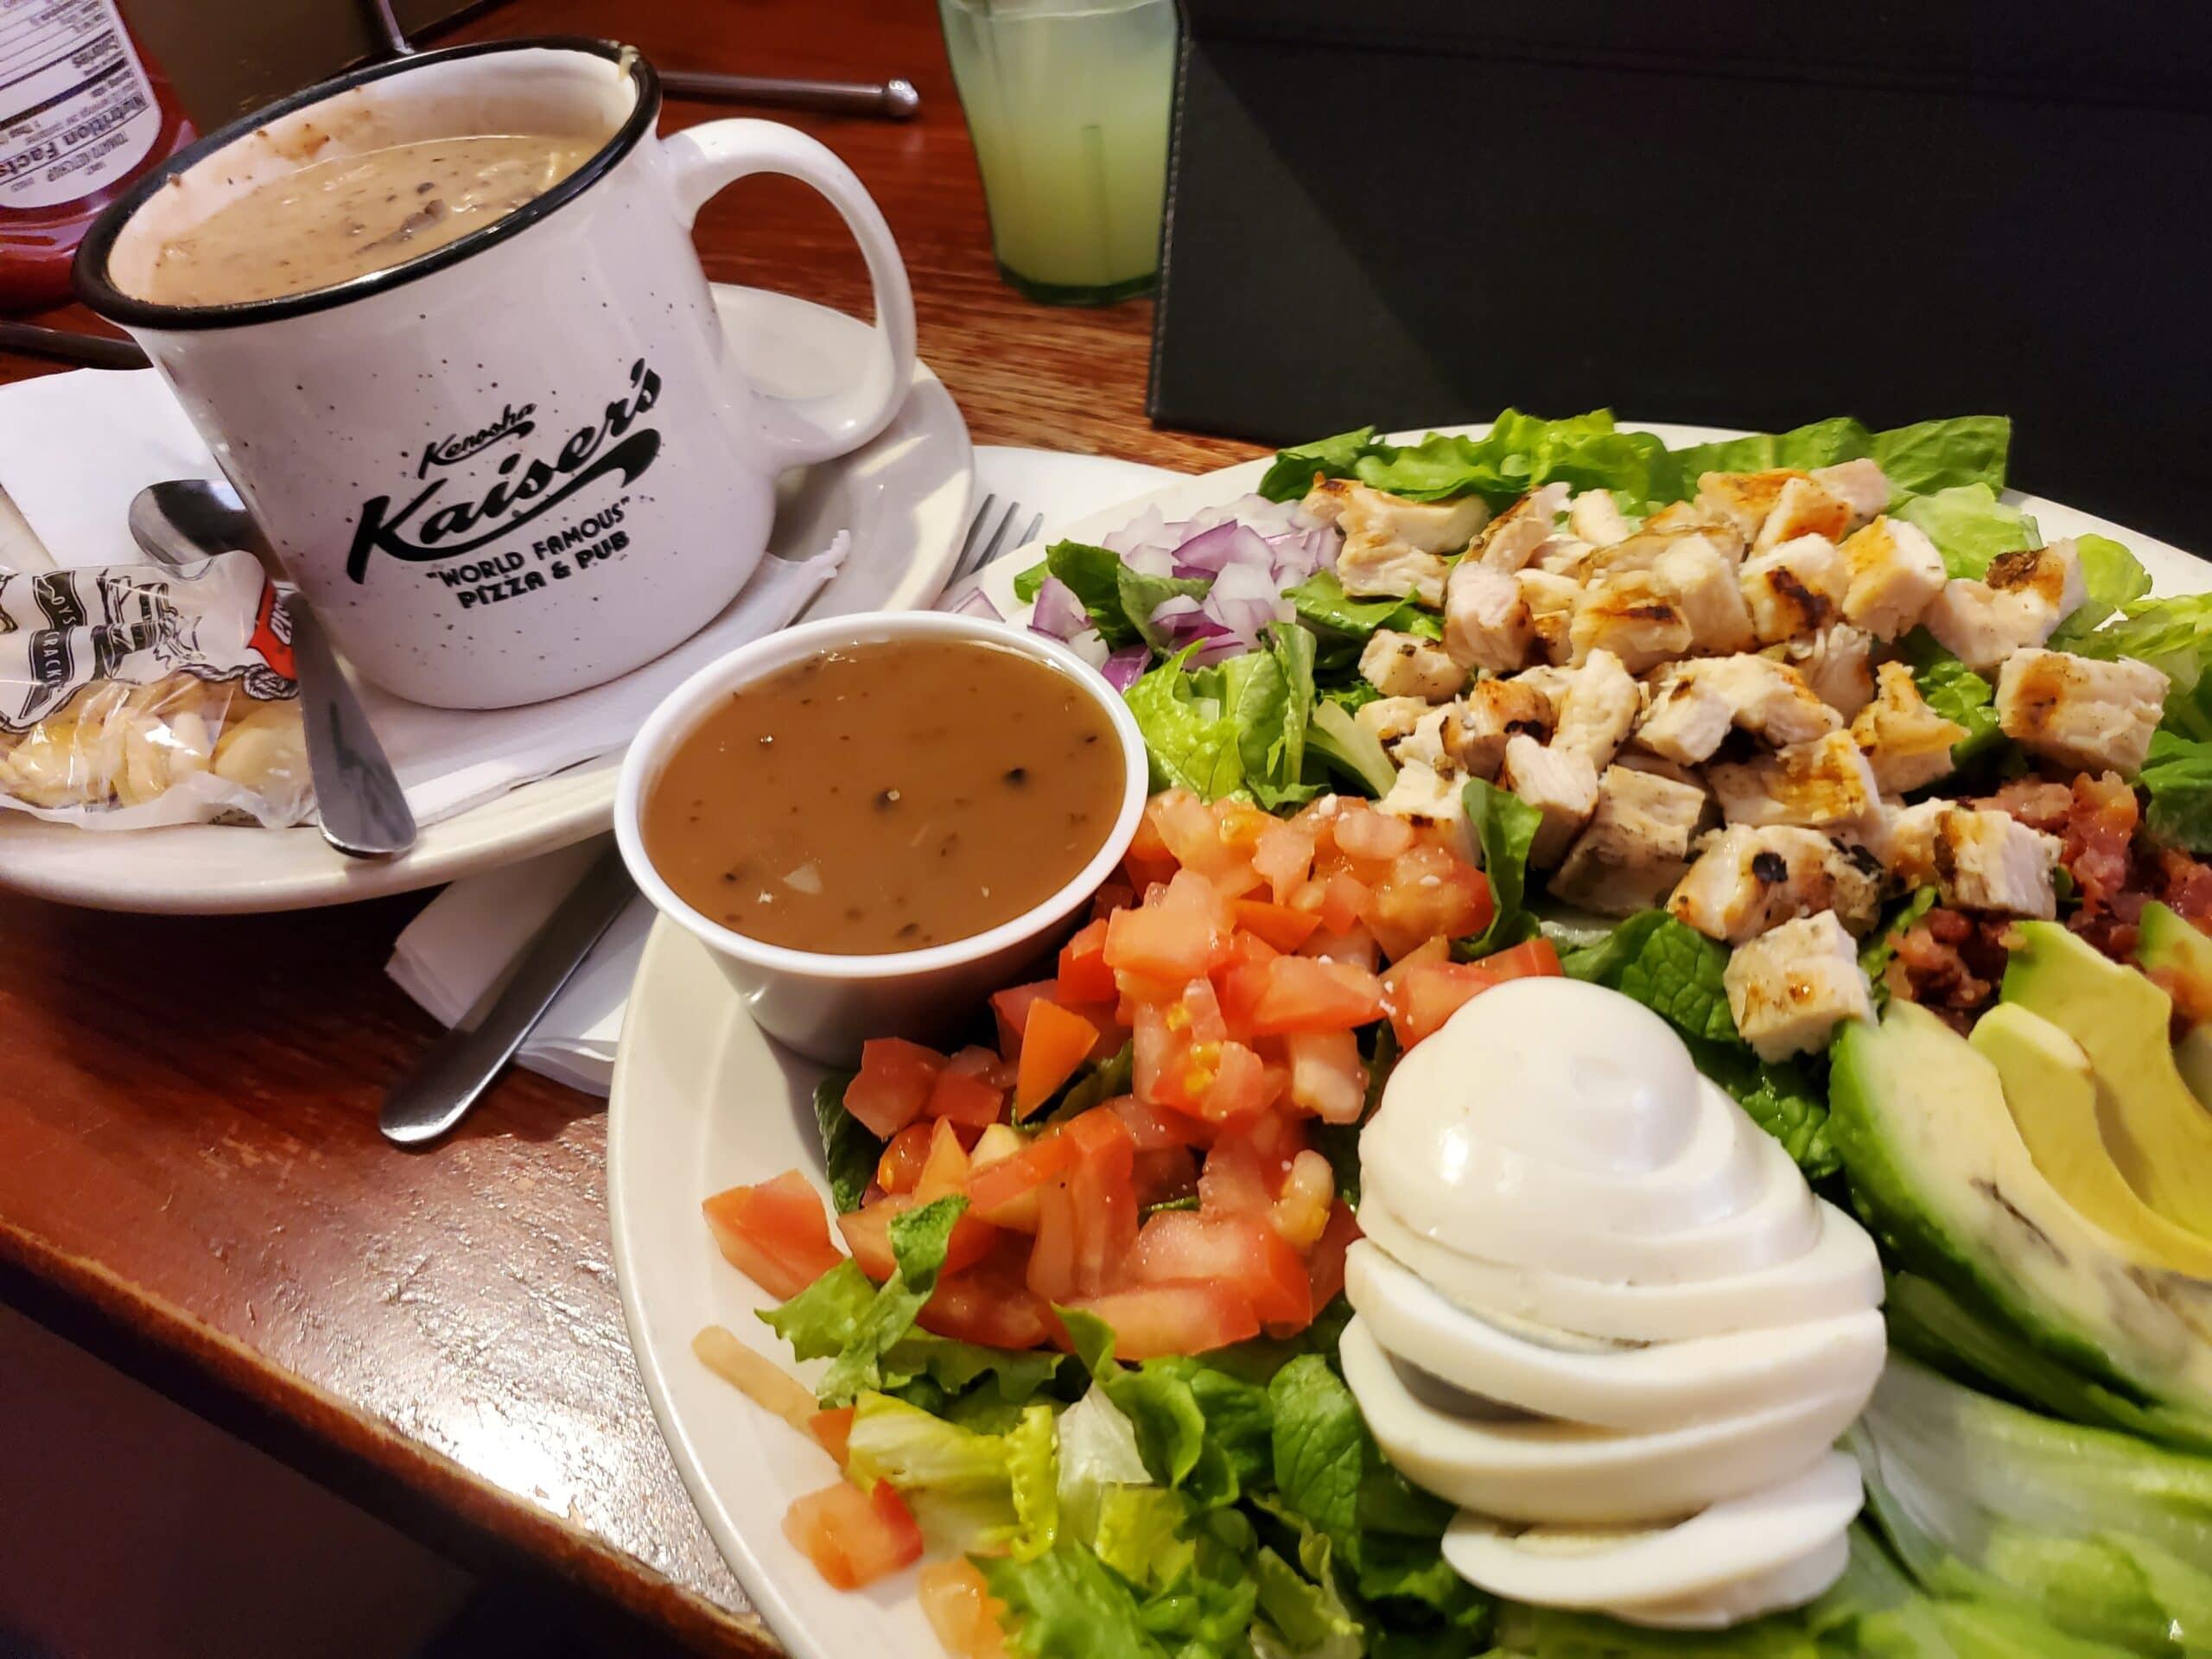 food in kenosha, kaiser's of kenosha, kaiser's pizza